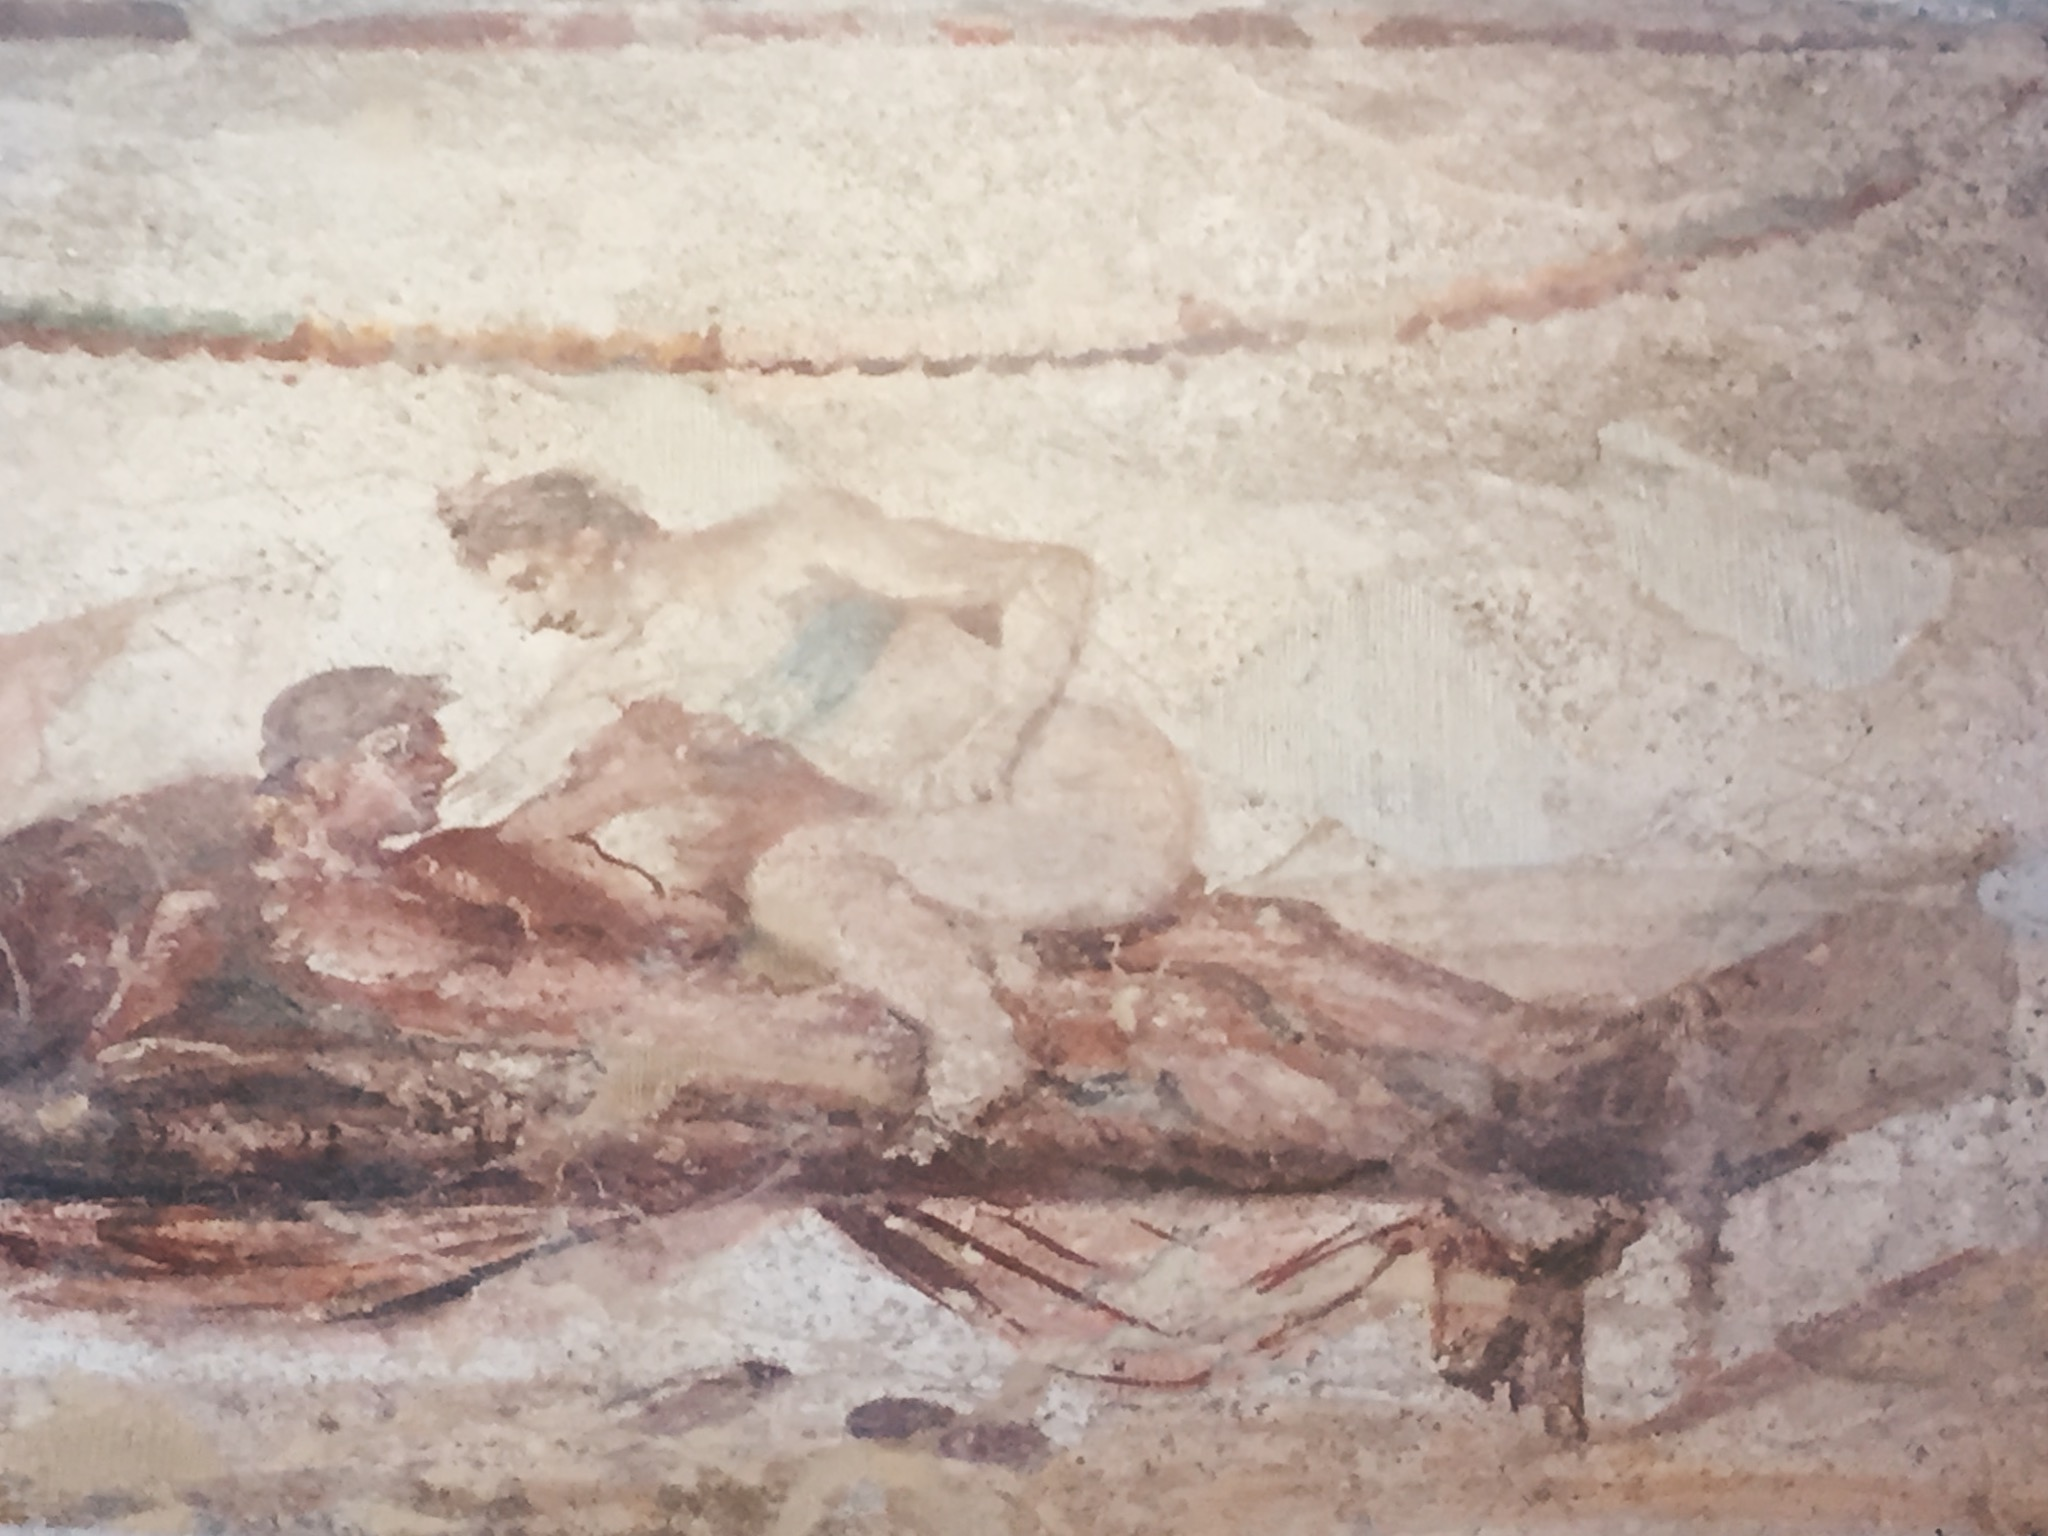 My Last Days of Pompeii Rory Mara The Attic on Eighth Brothel Illustrations.JPG